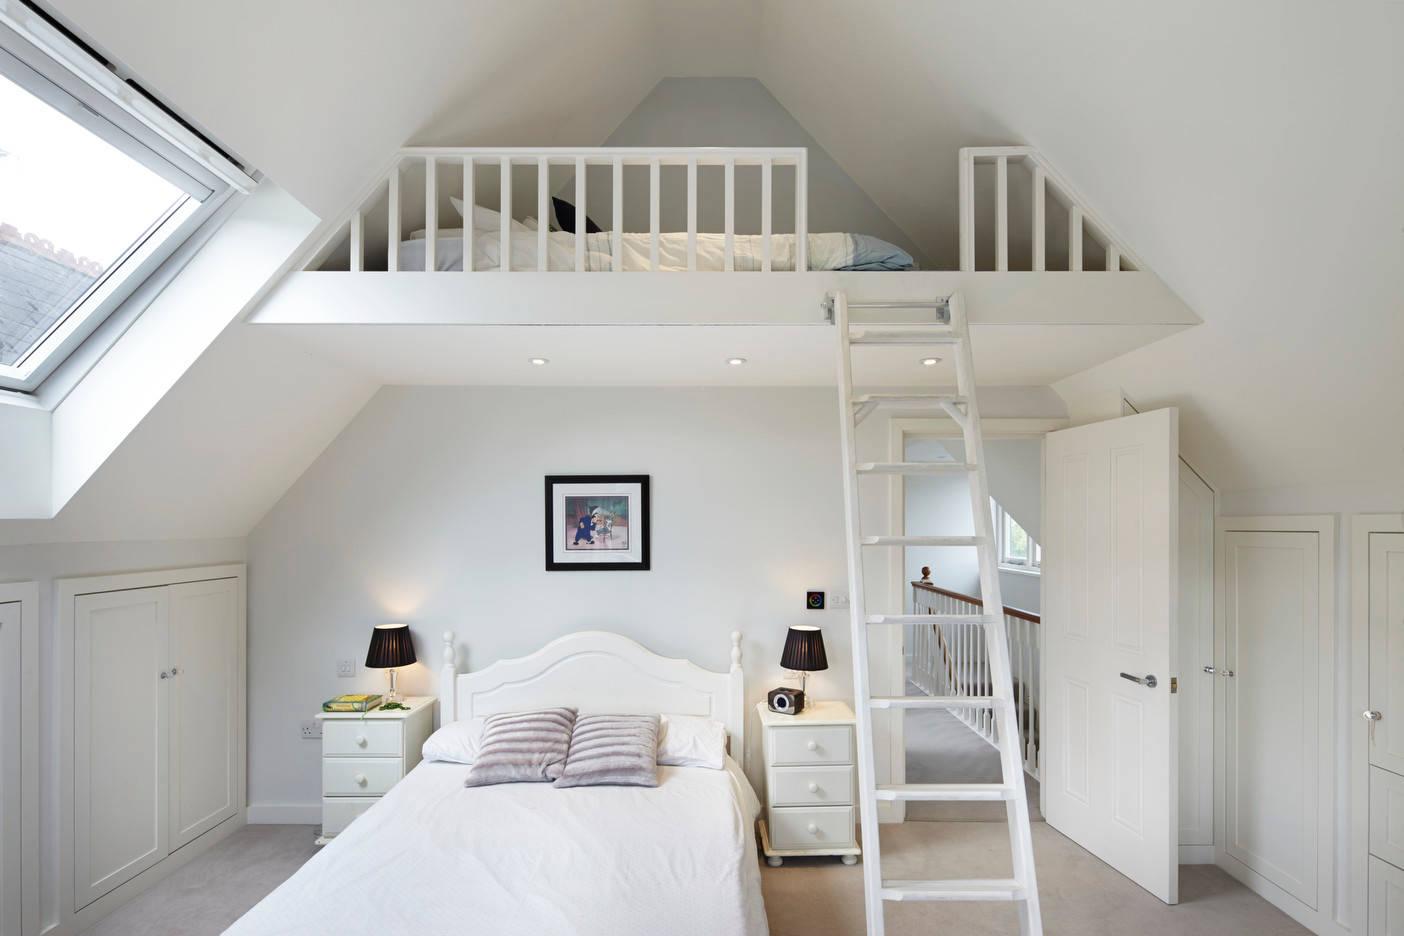 kamar tidur 2 lantai 2